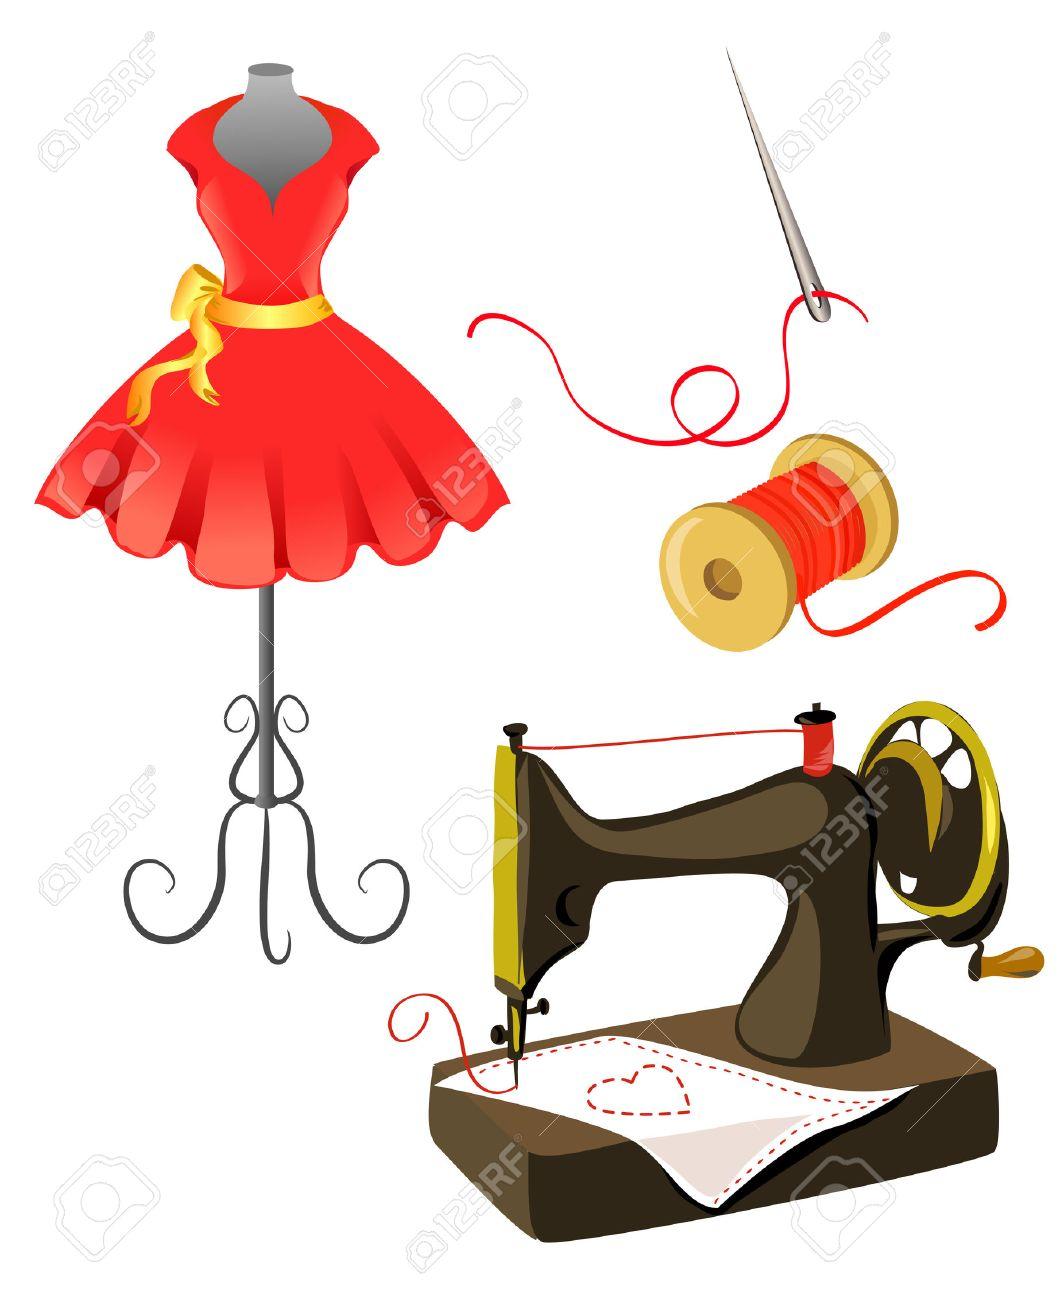 mannequin, dress, sewing machine isolated. vector illustration Standard-Bild - 26233843